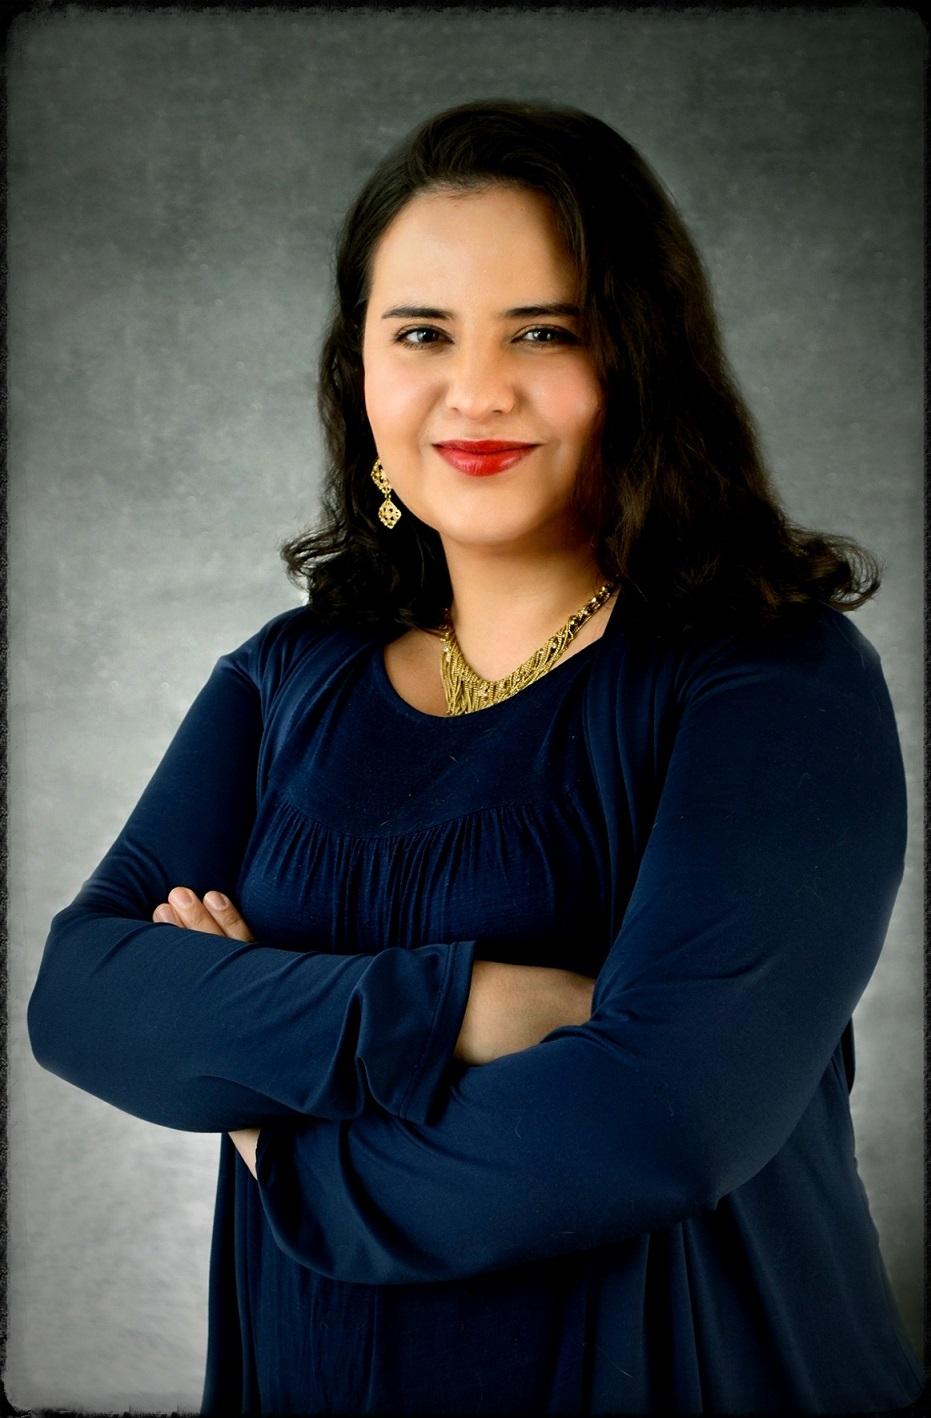 María Angélica Durán